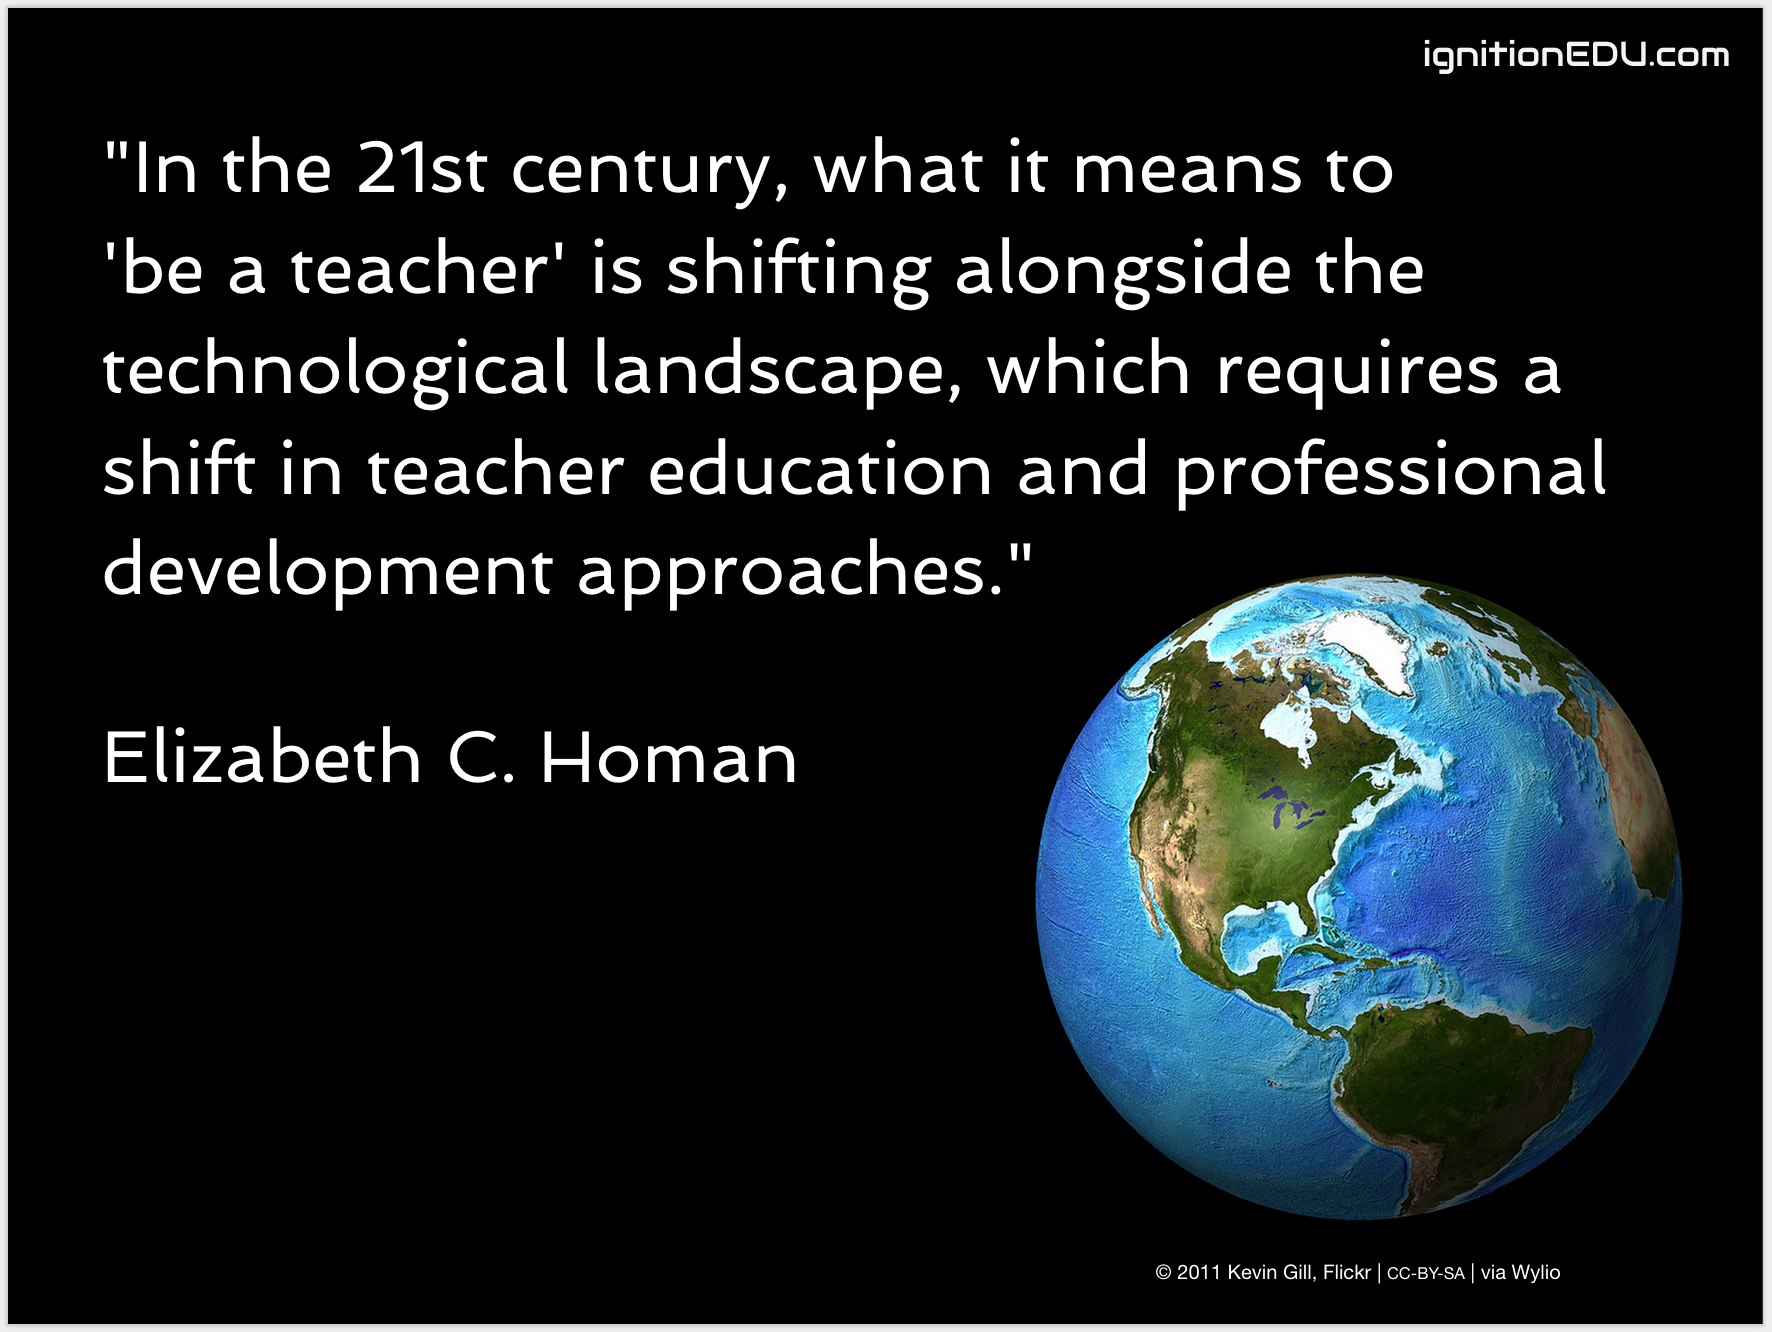 Quote by Liz Homan